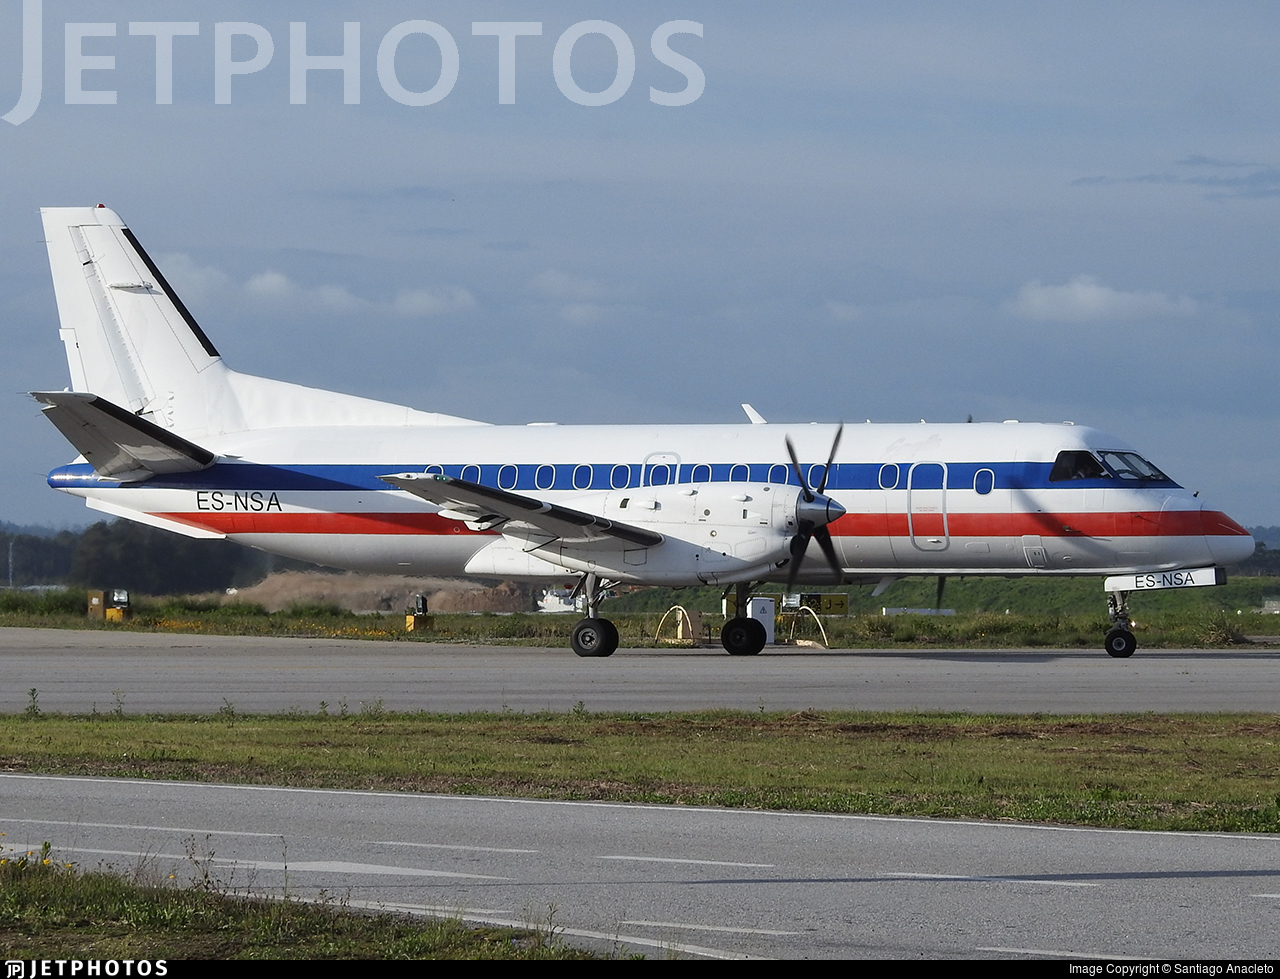 ES-NSA - Saab 340B(F) - NyxAir